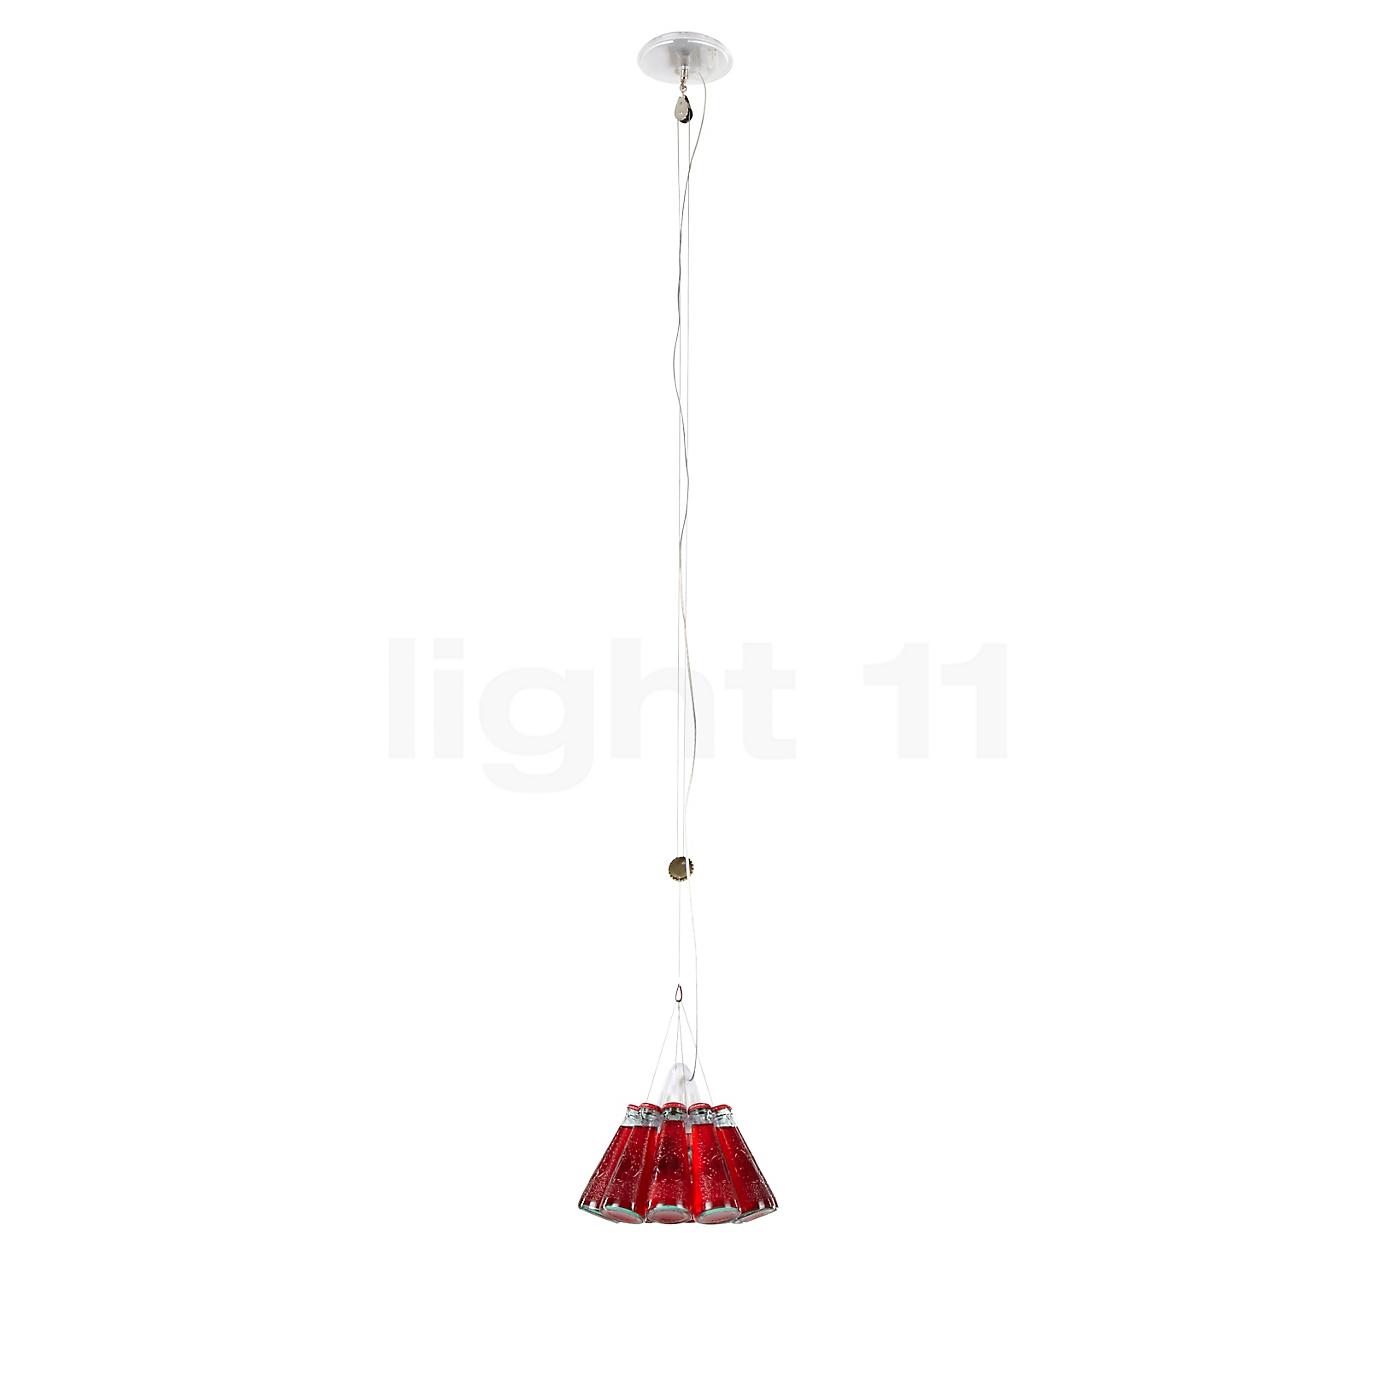 Ingo maurer campari light 155 da comprare su for Ingo maurer lampadario